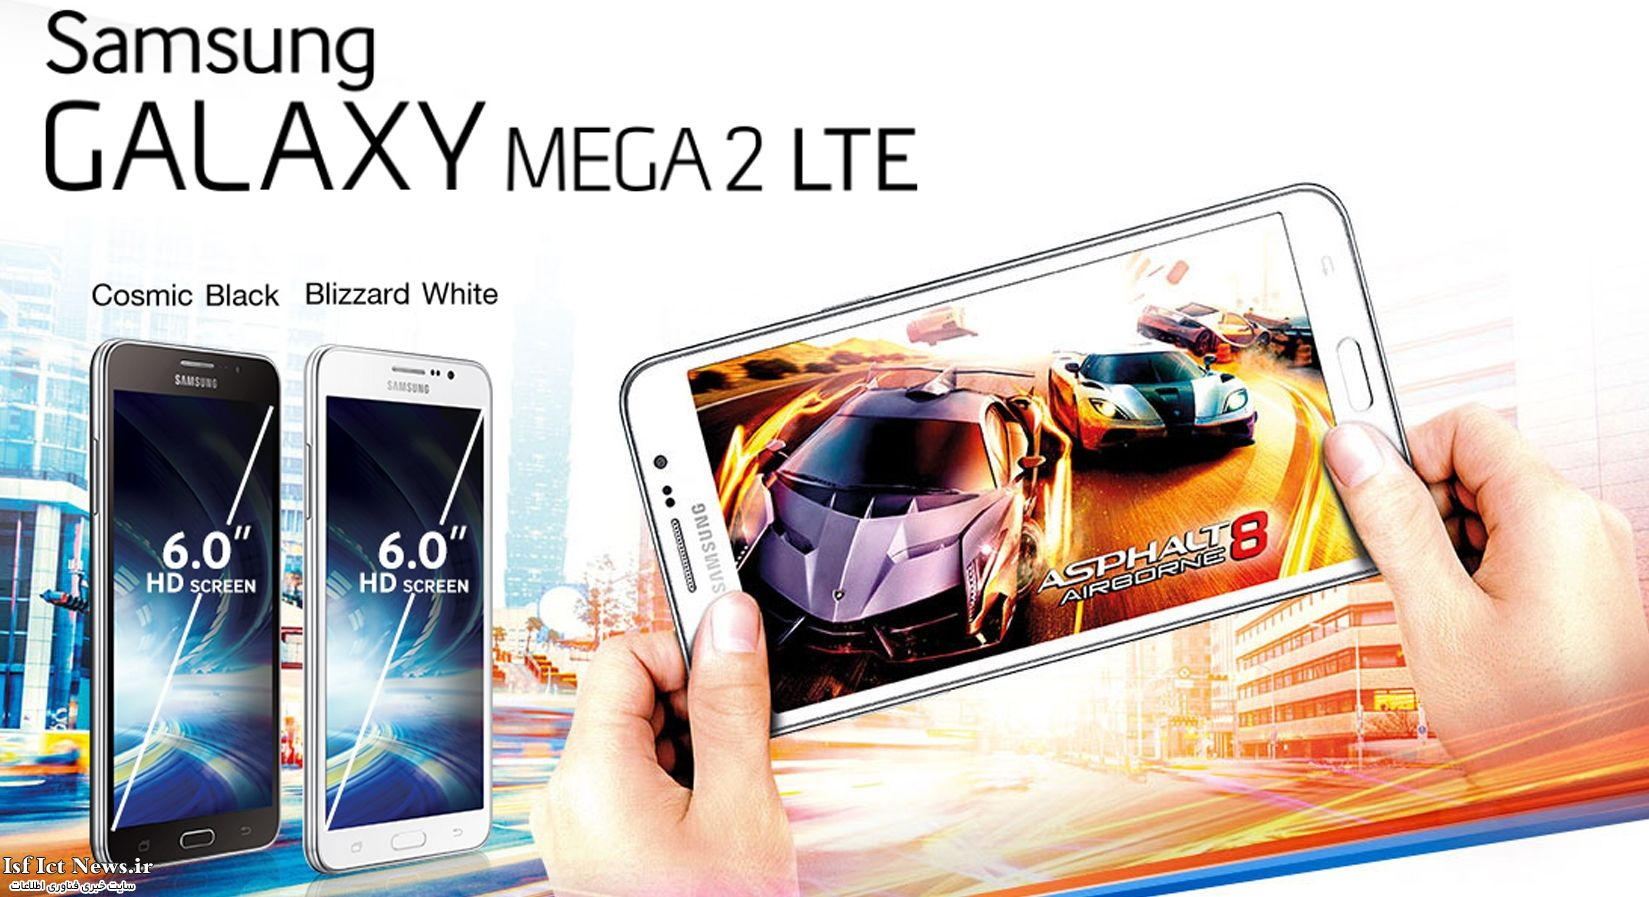 Samsung-Galaxy-Mega-2-model-number-SM-G750F_2